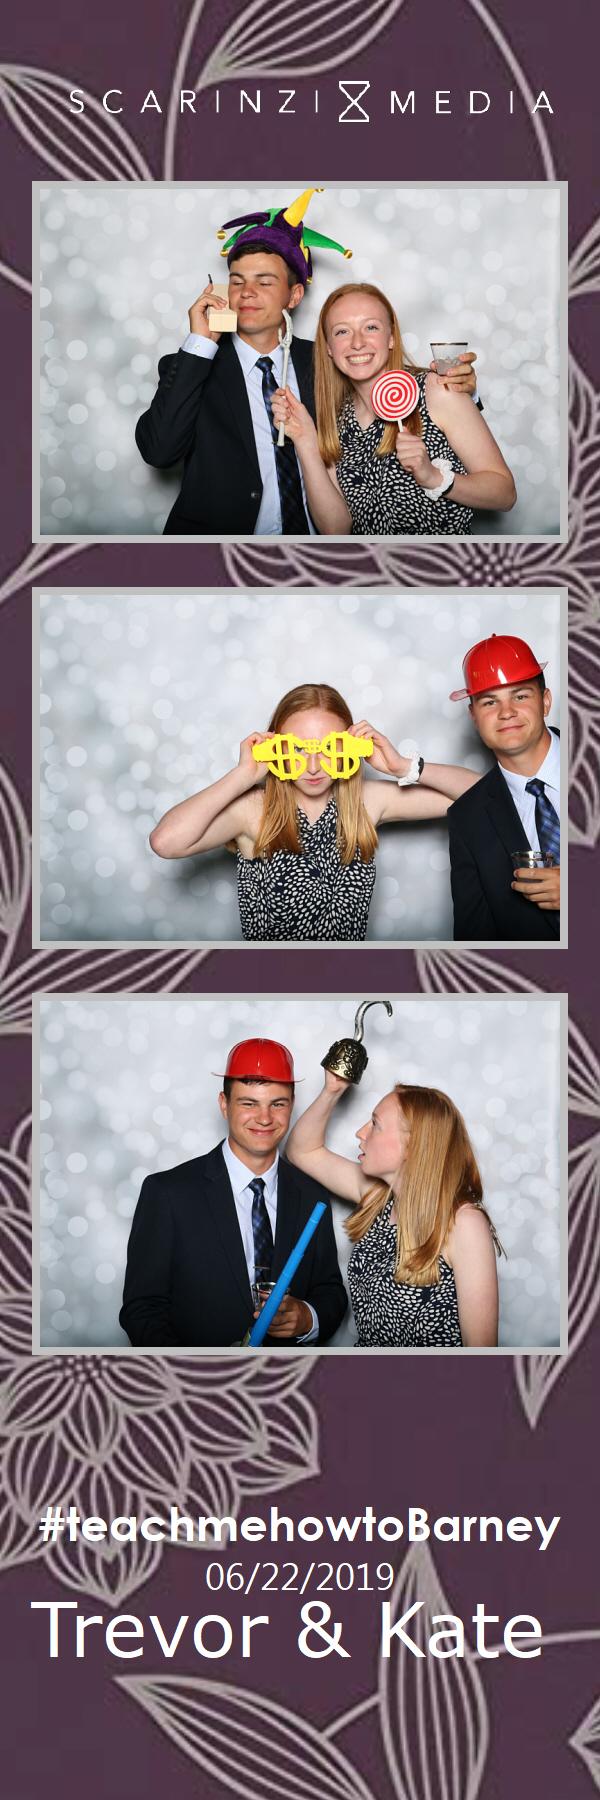 2019.06.22 - Barney Wedding PHOTOBOOTH05.jpg